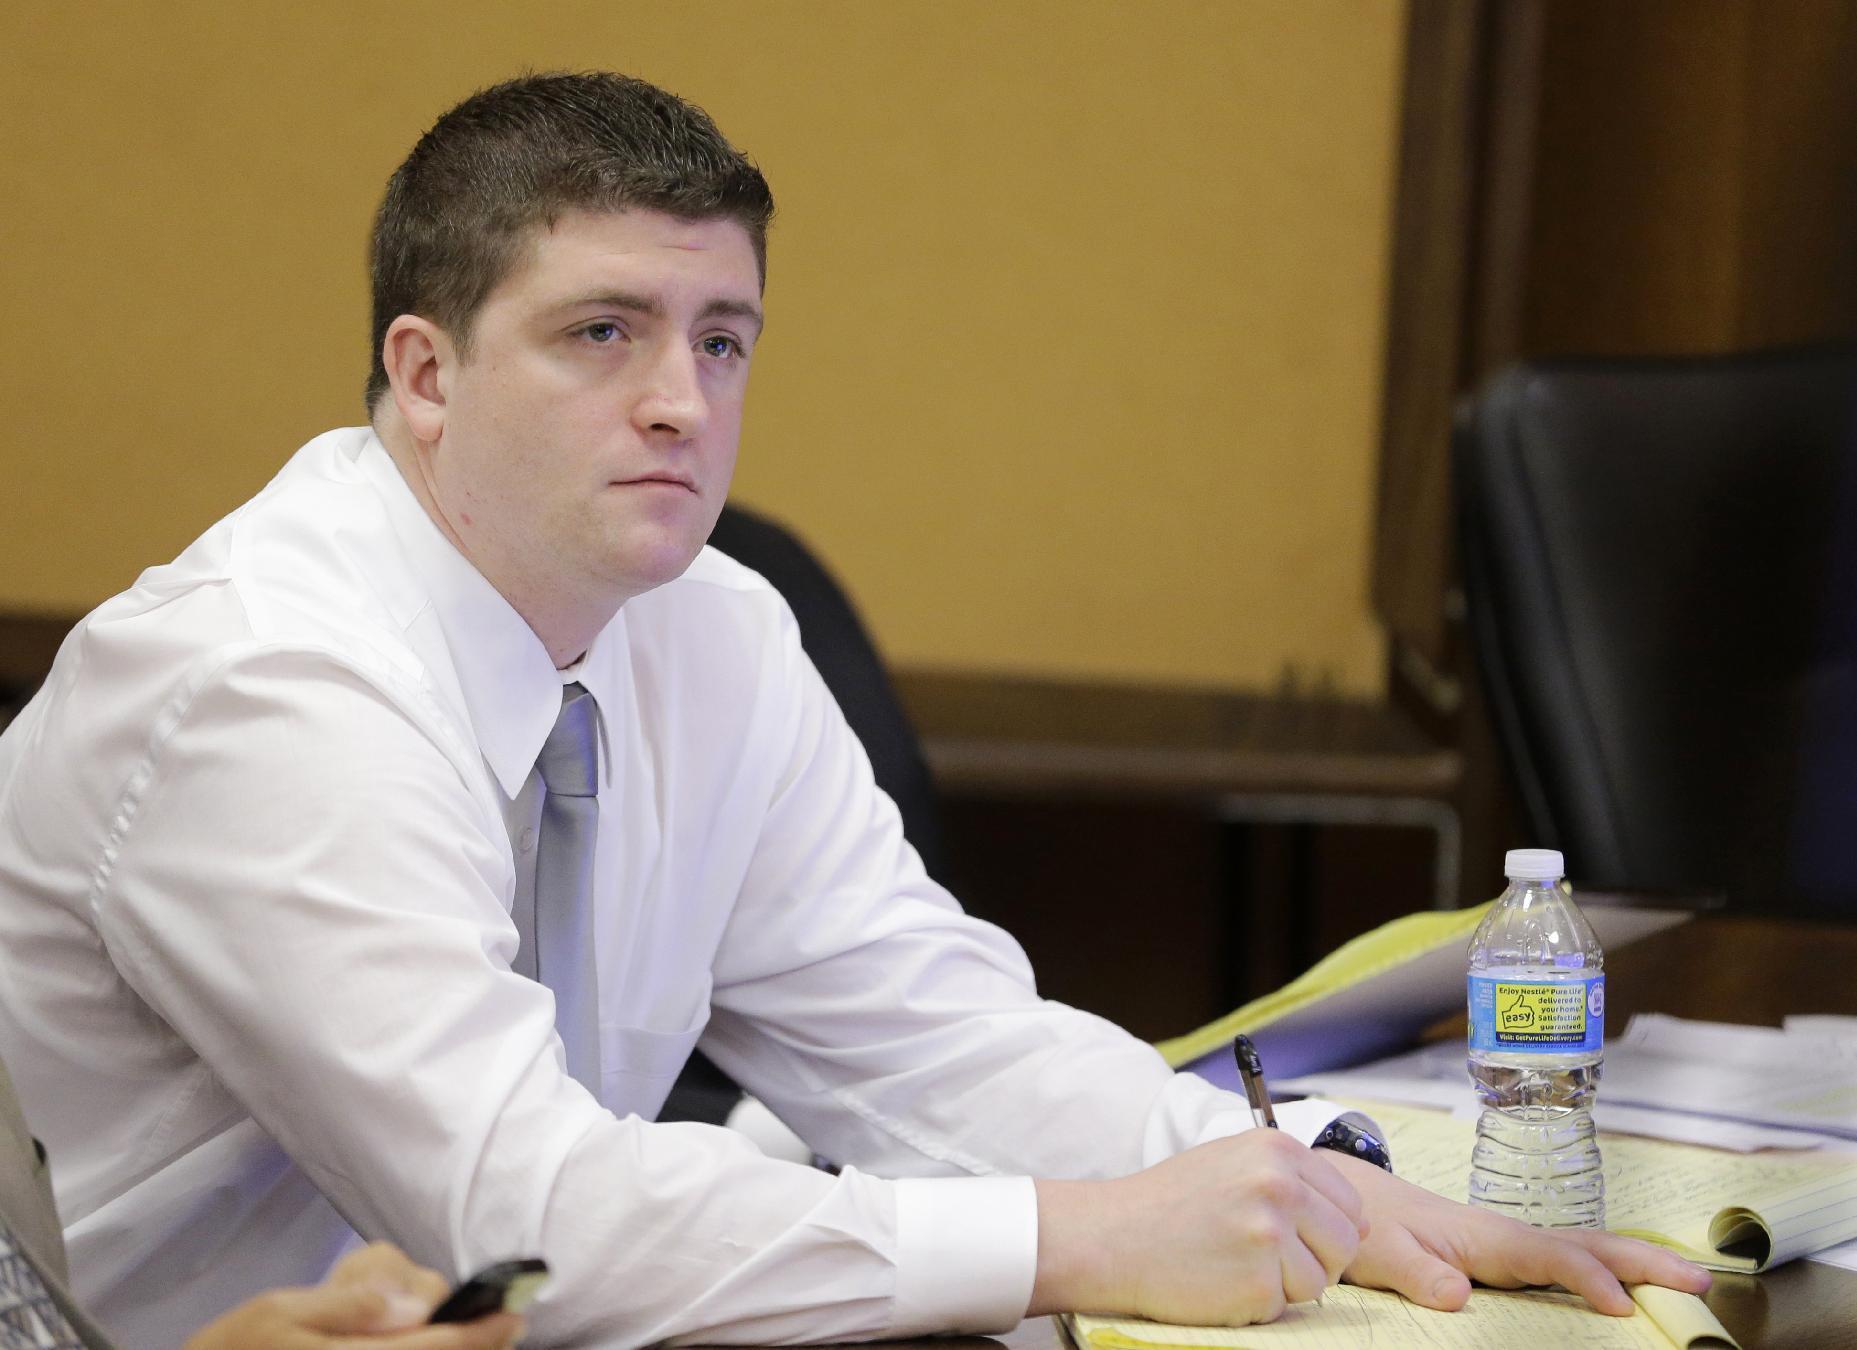 Ohio patrolman acquitted in 2 deaths amid 137-shot barrage